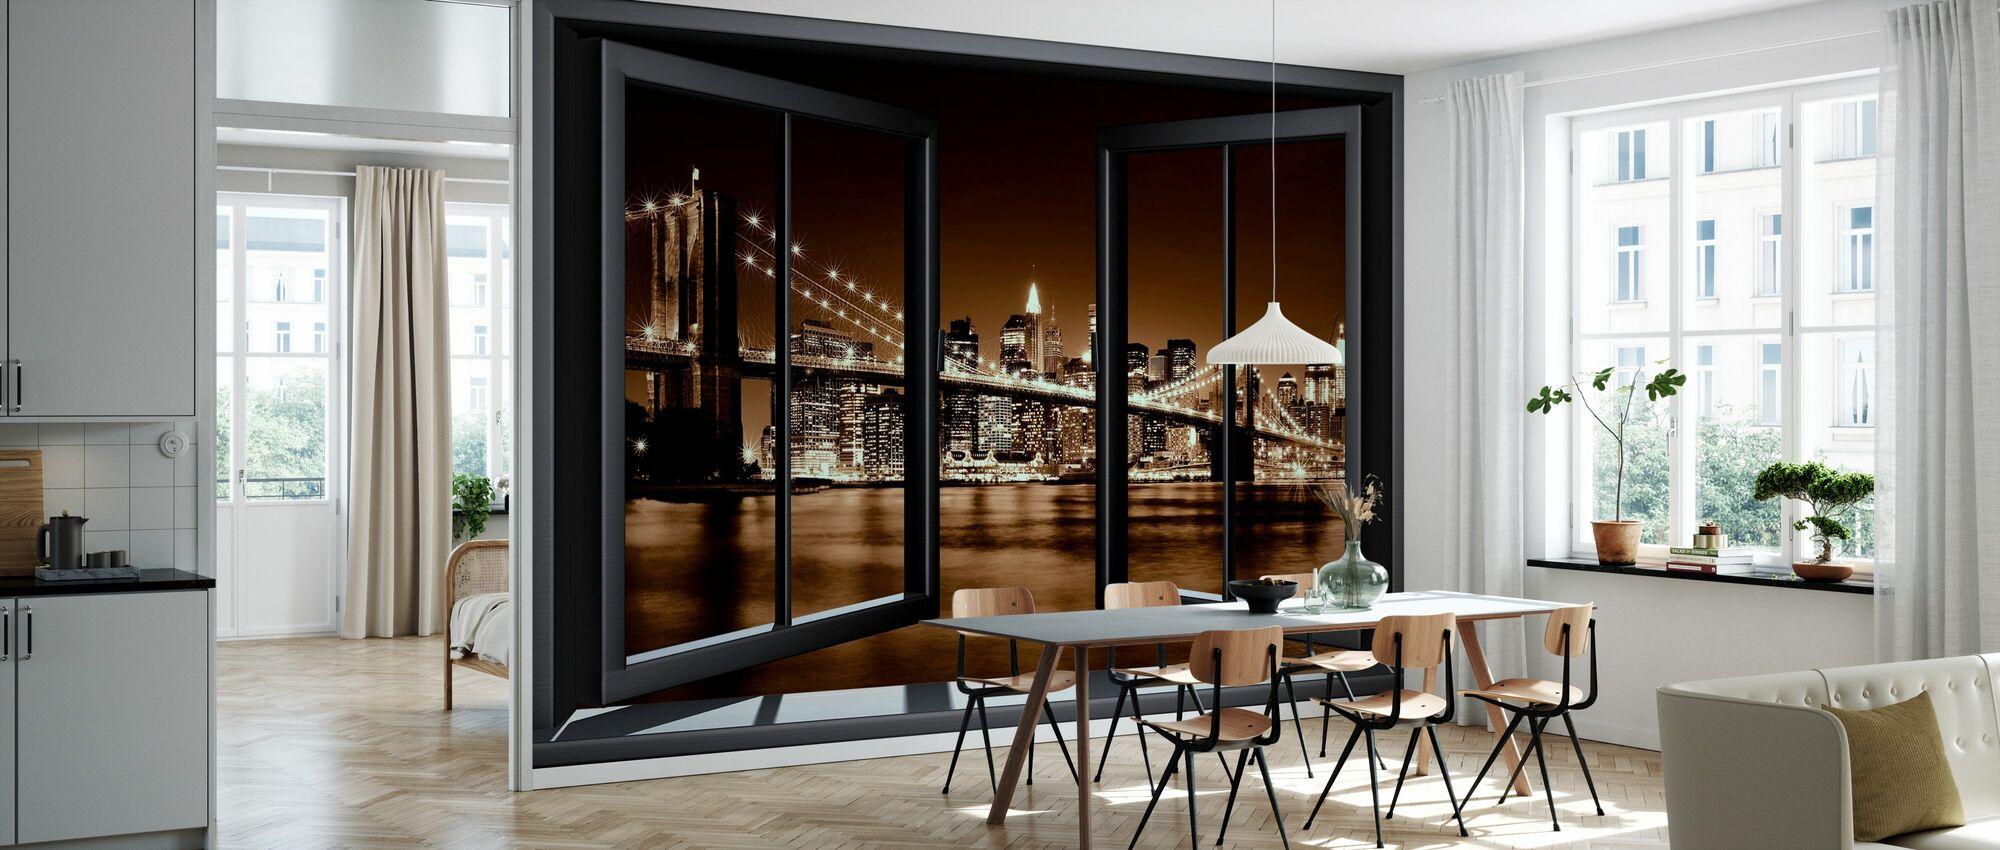 Brooklyn Bridge genom fönster - Gul - Tapet - Kök